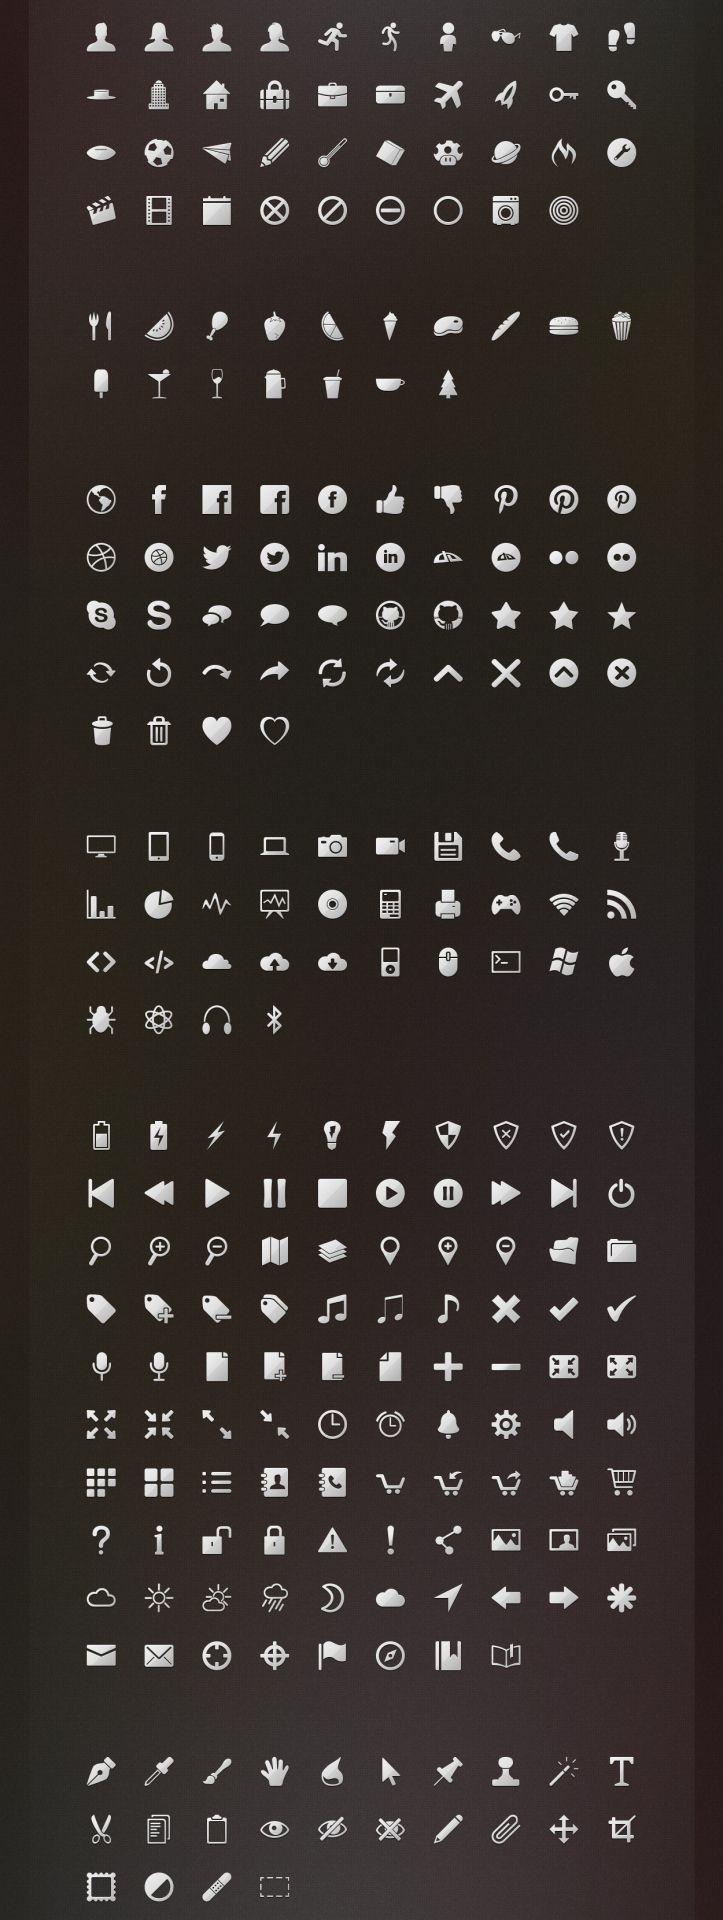 256 Free Icons